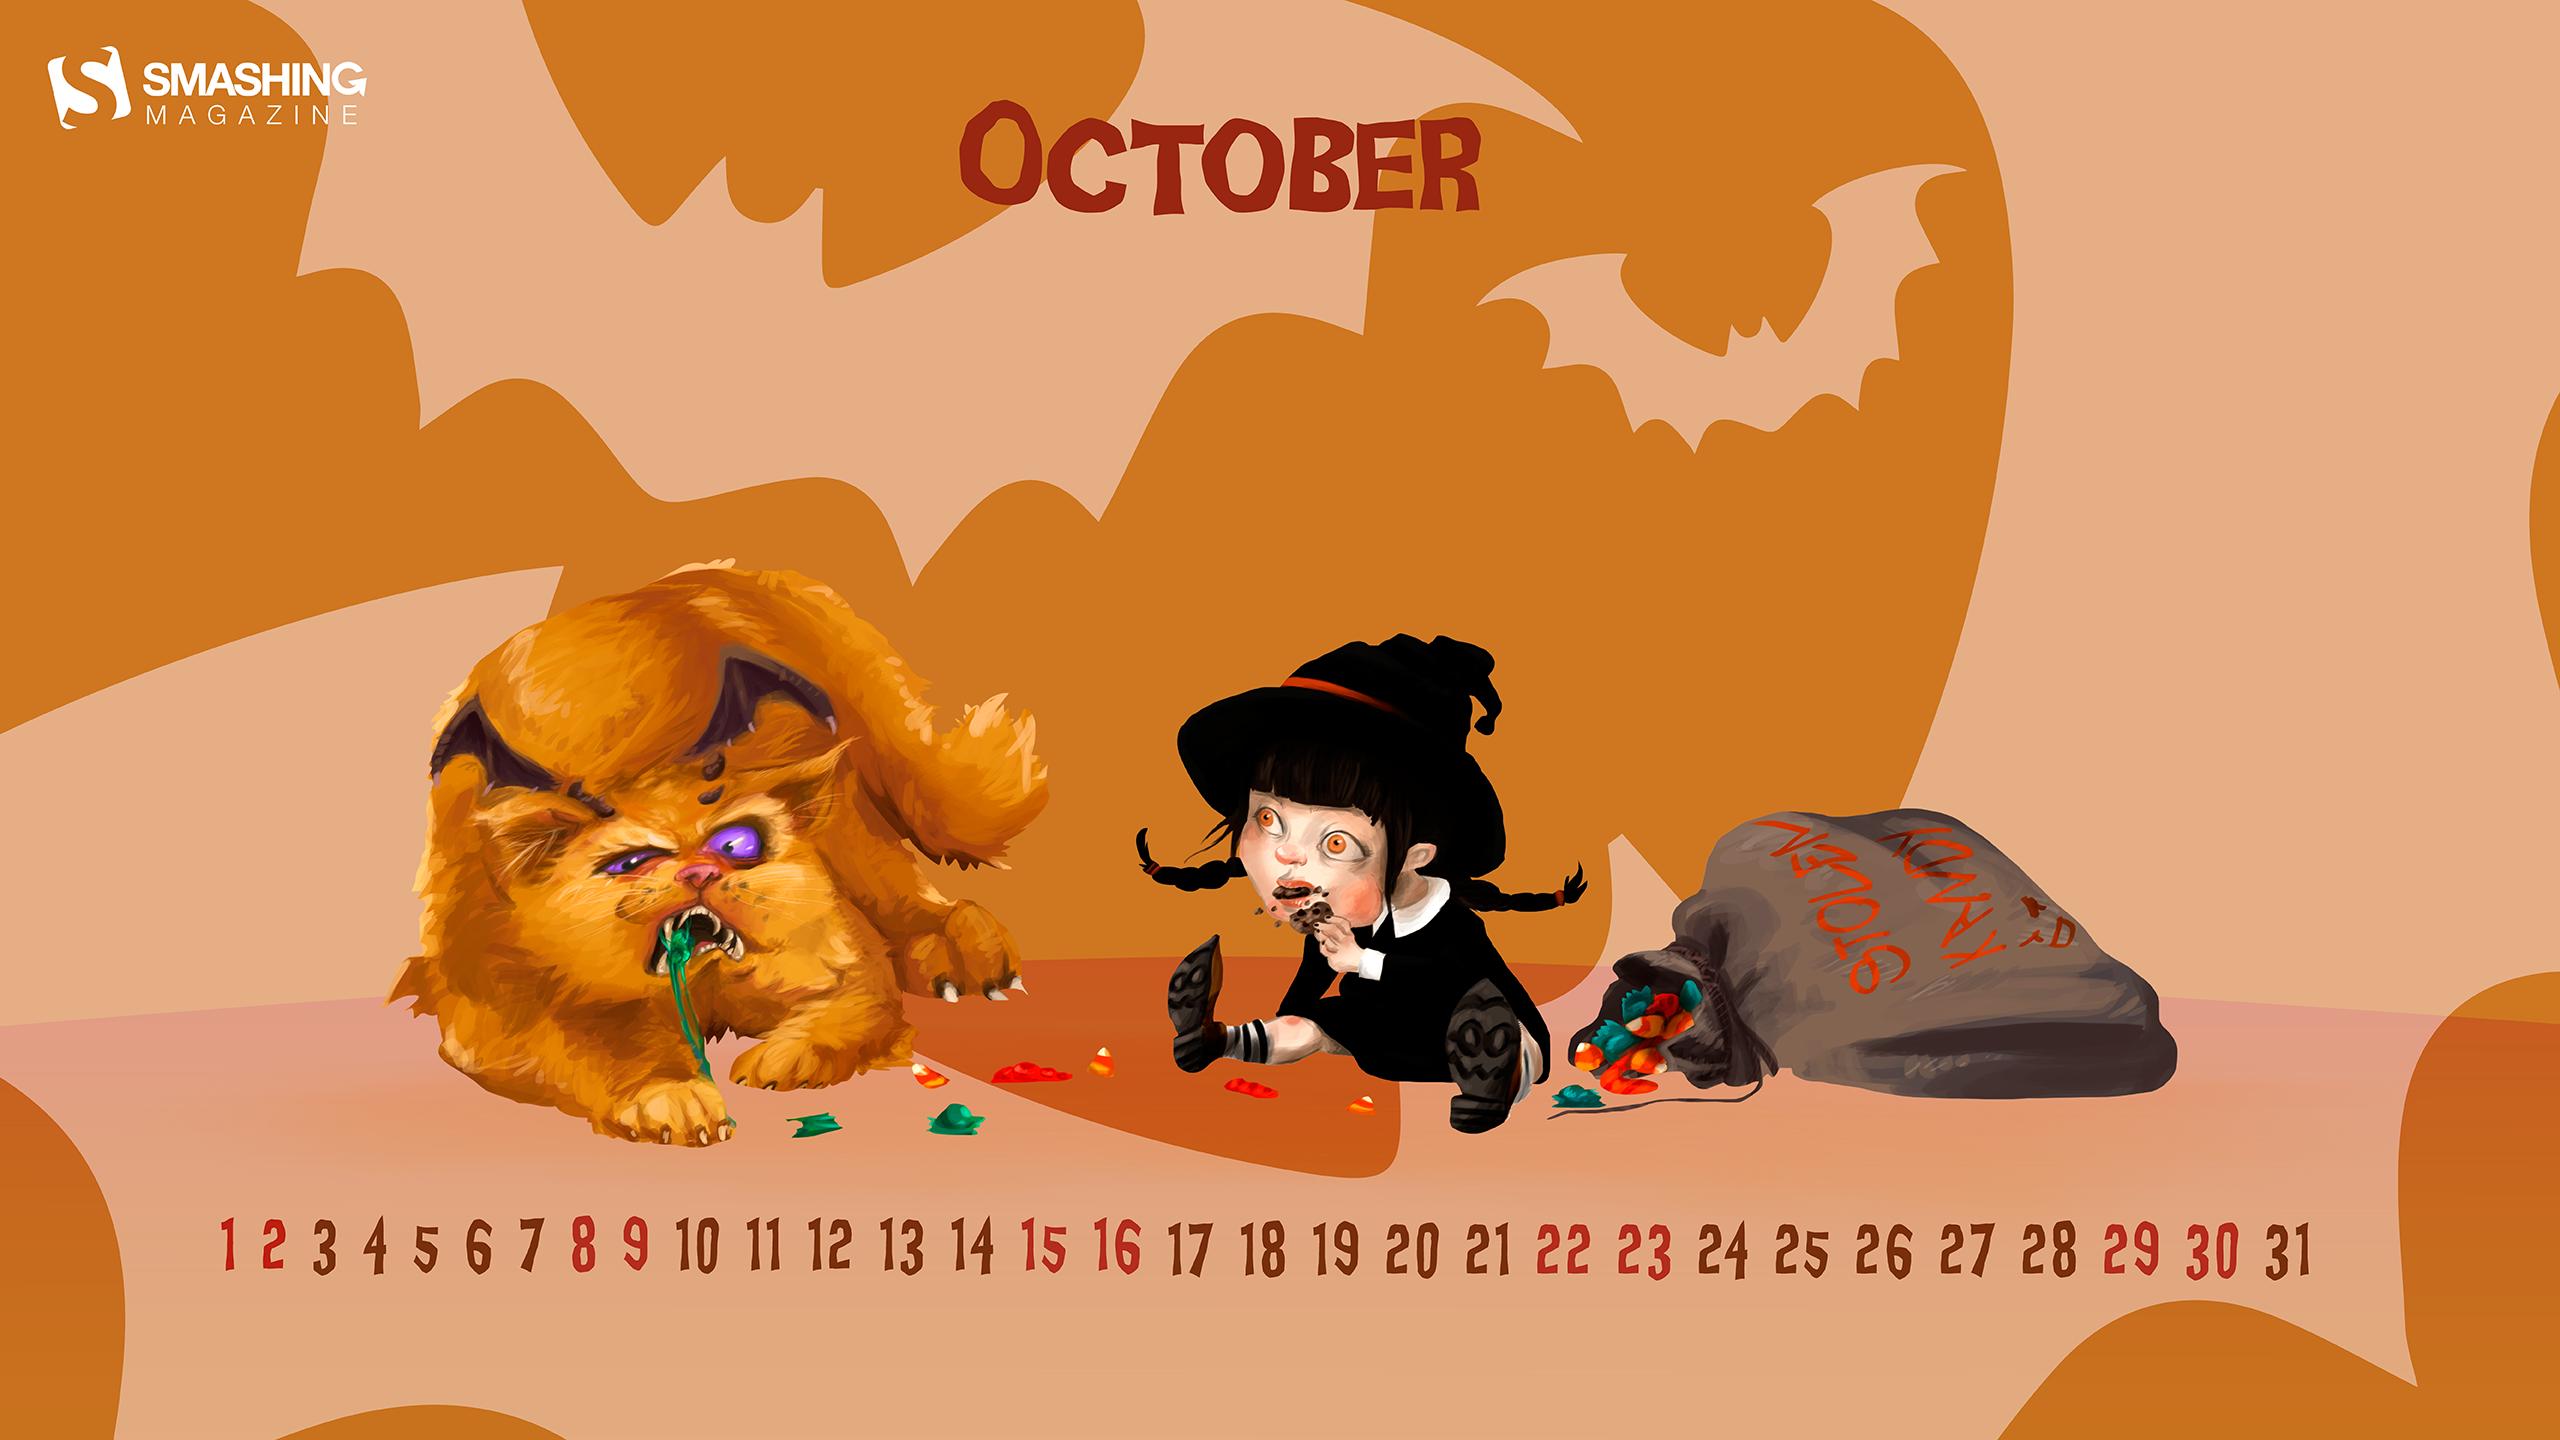 Desktop Wallpaper Calendars October 2016 Smashing Magazine